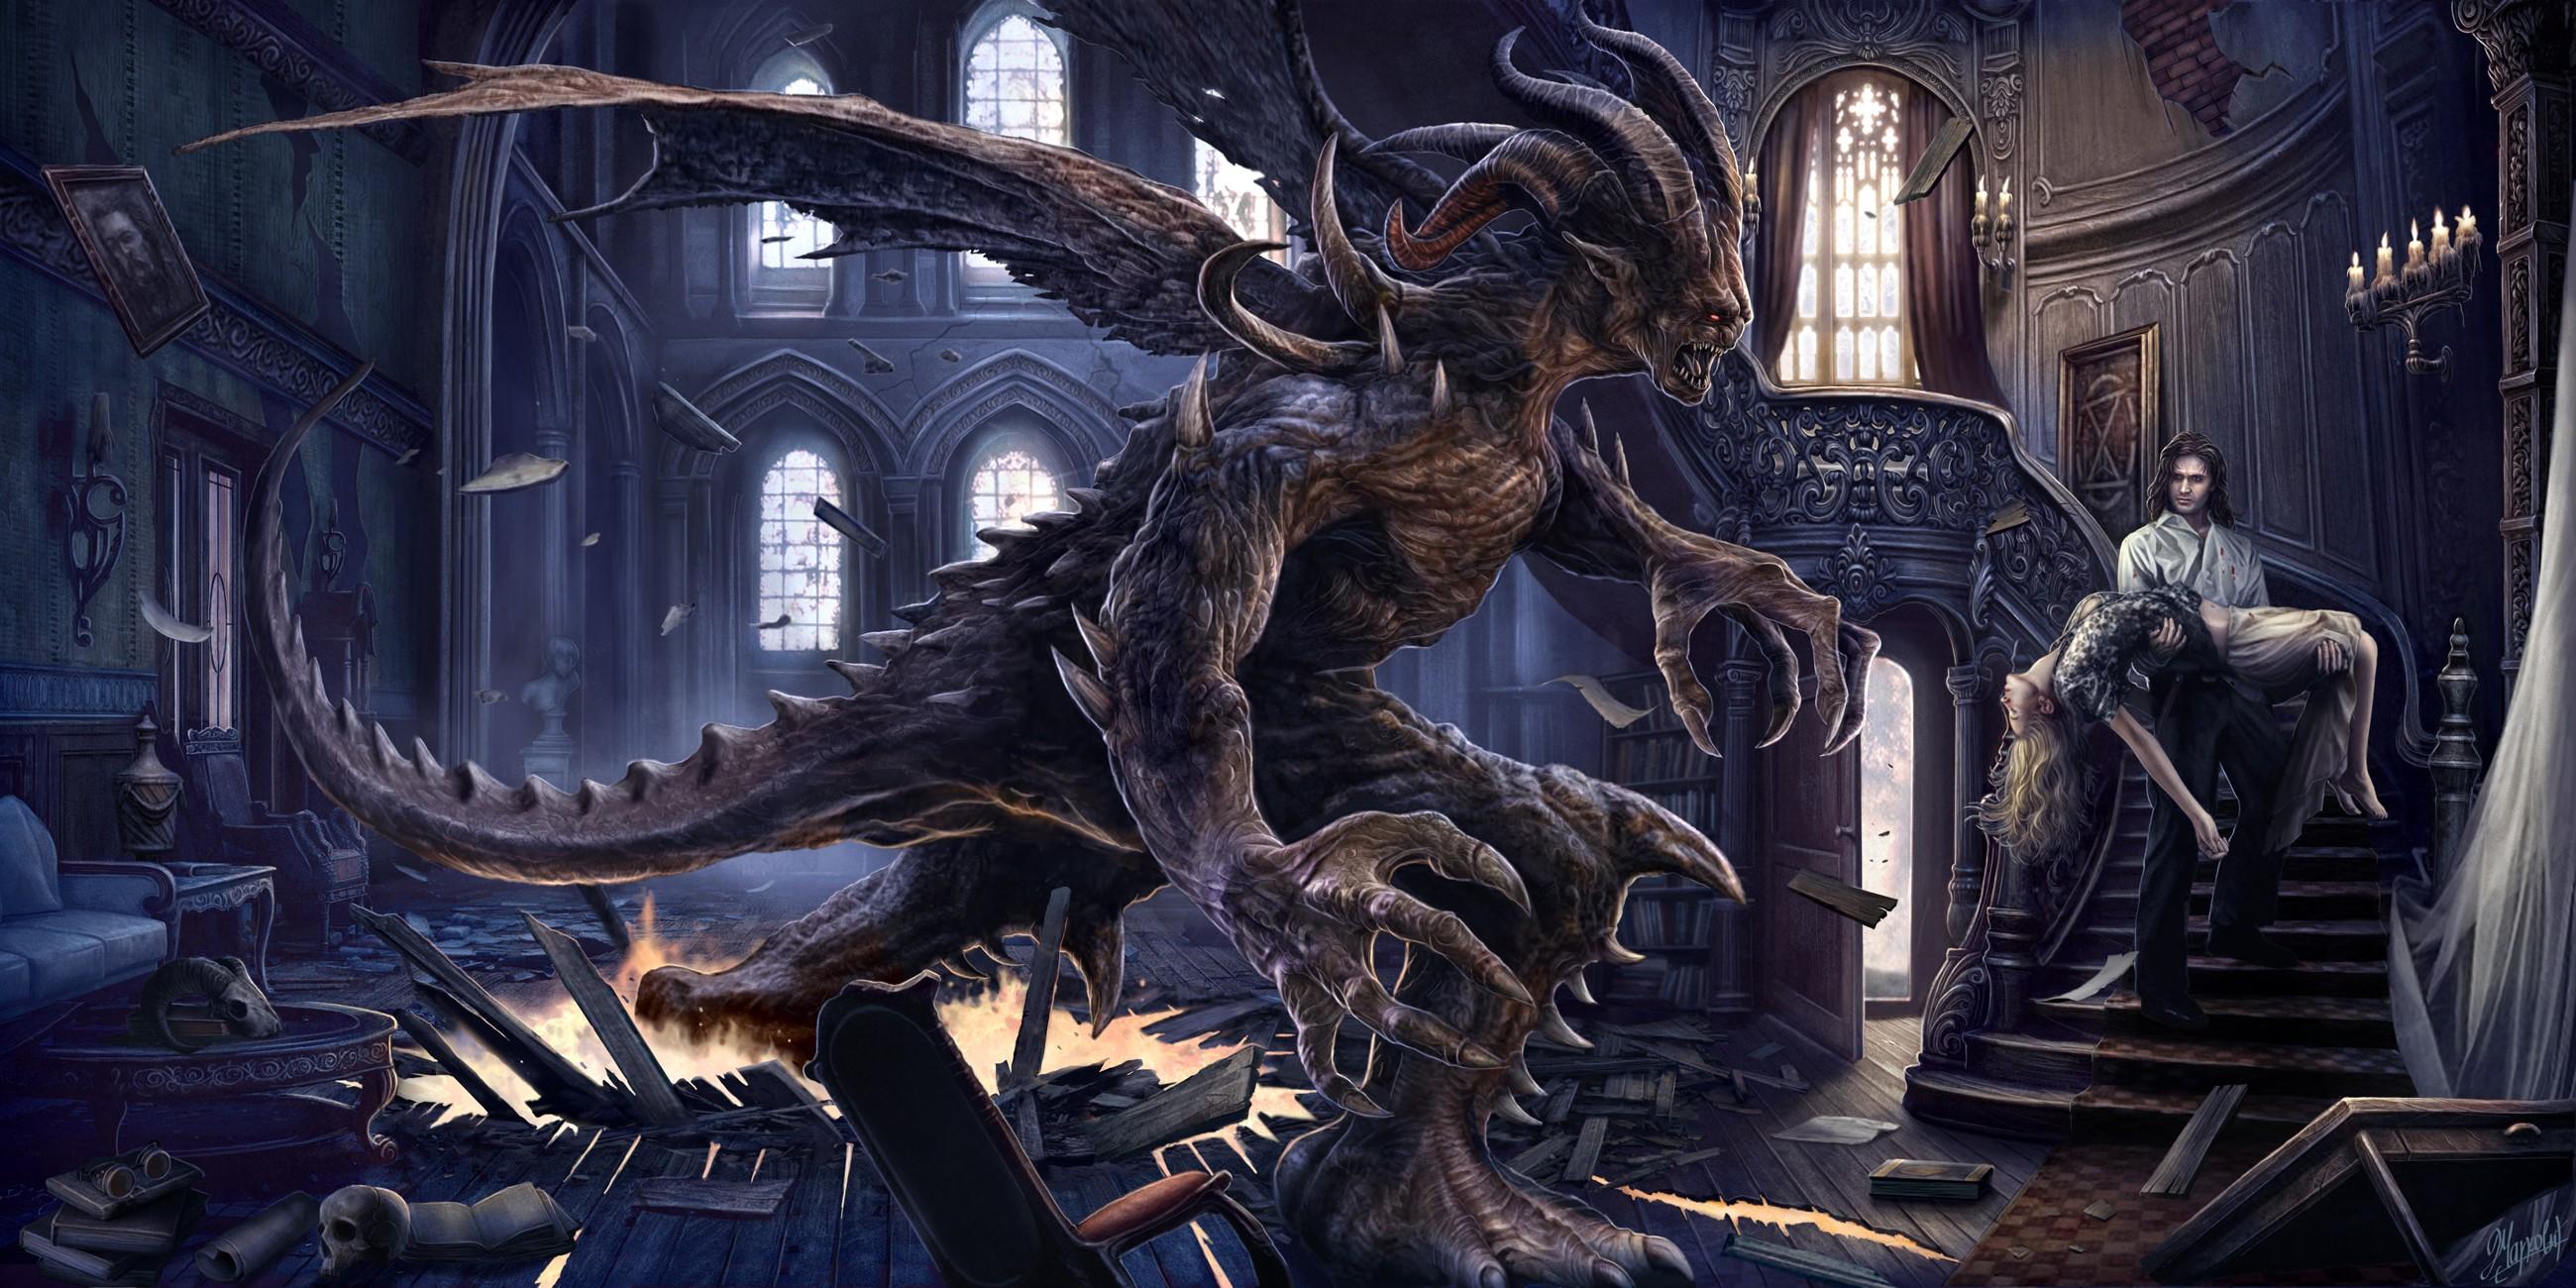 General 2600x1300 fantasy art artwork digital art creature interior couple staircase demon Victorian hell skull window dead